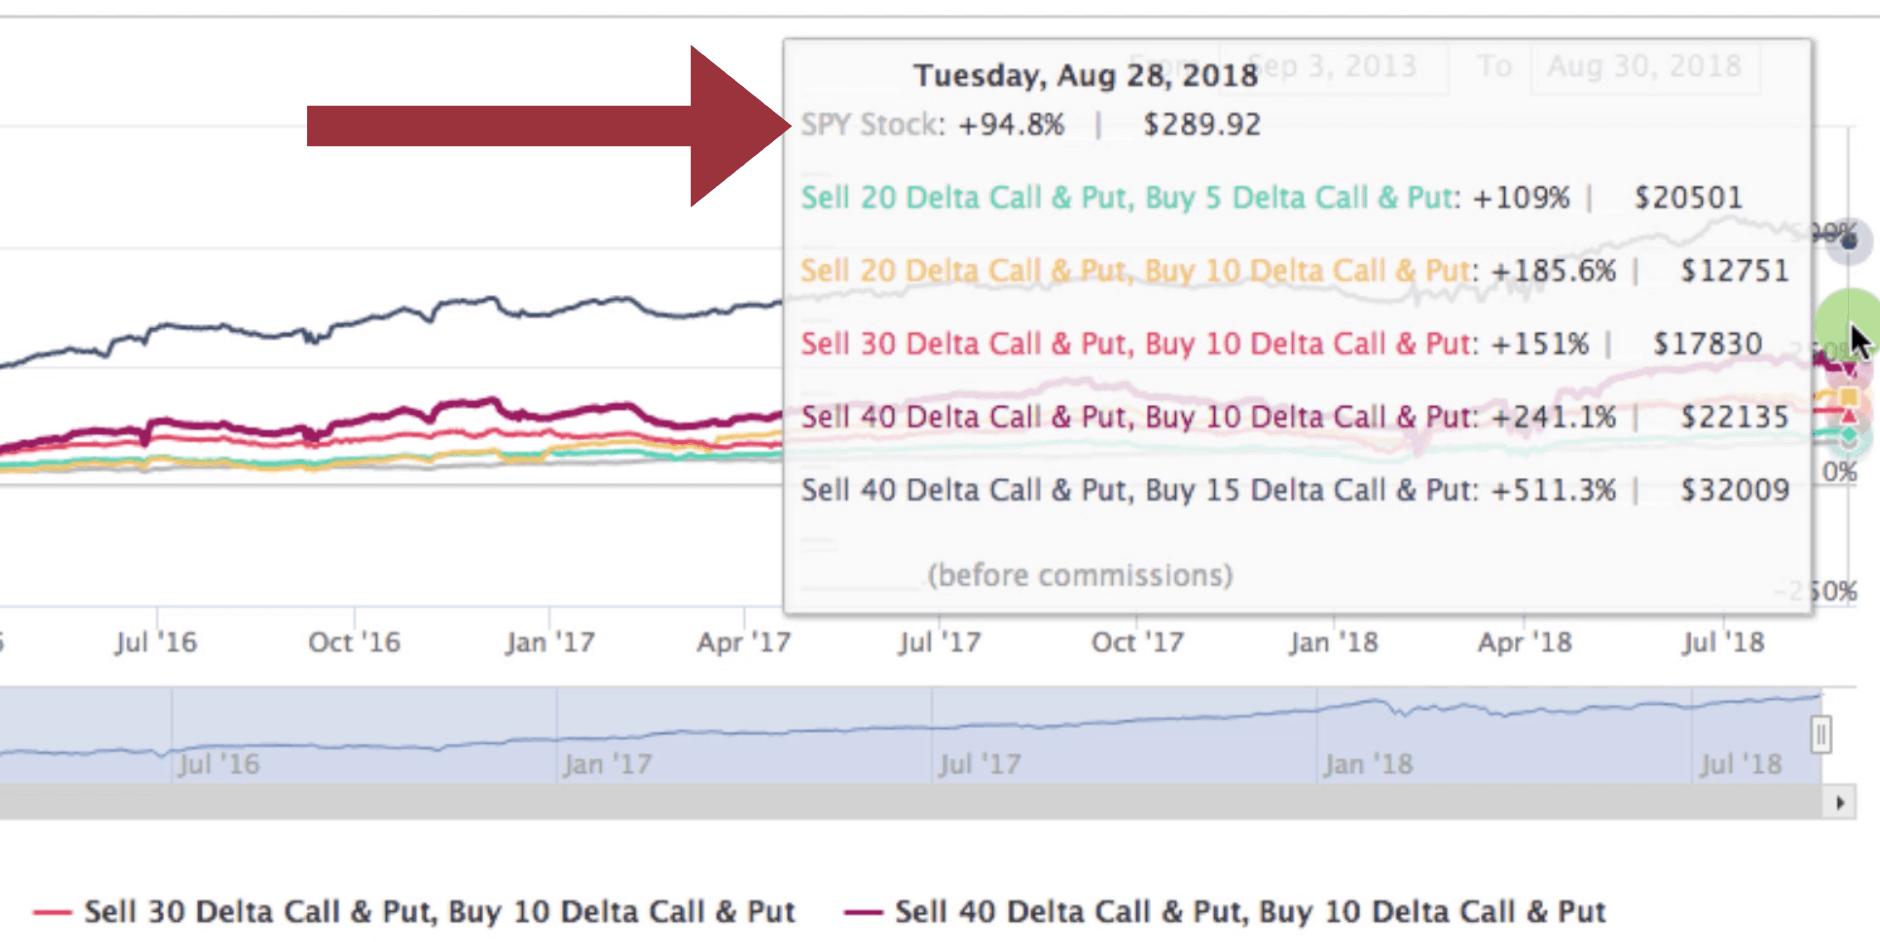 SPY stock price gain